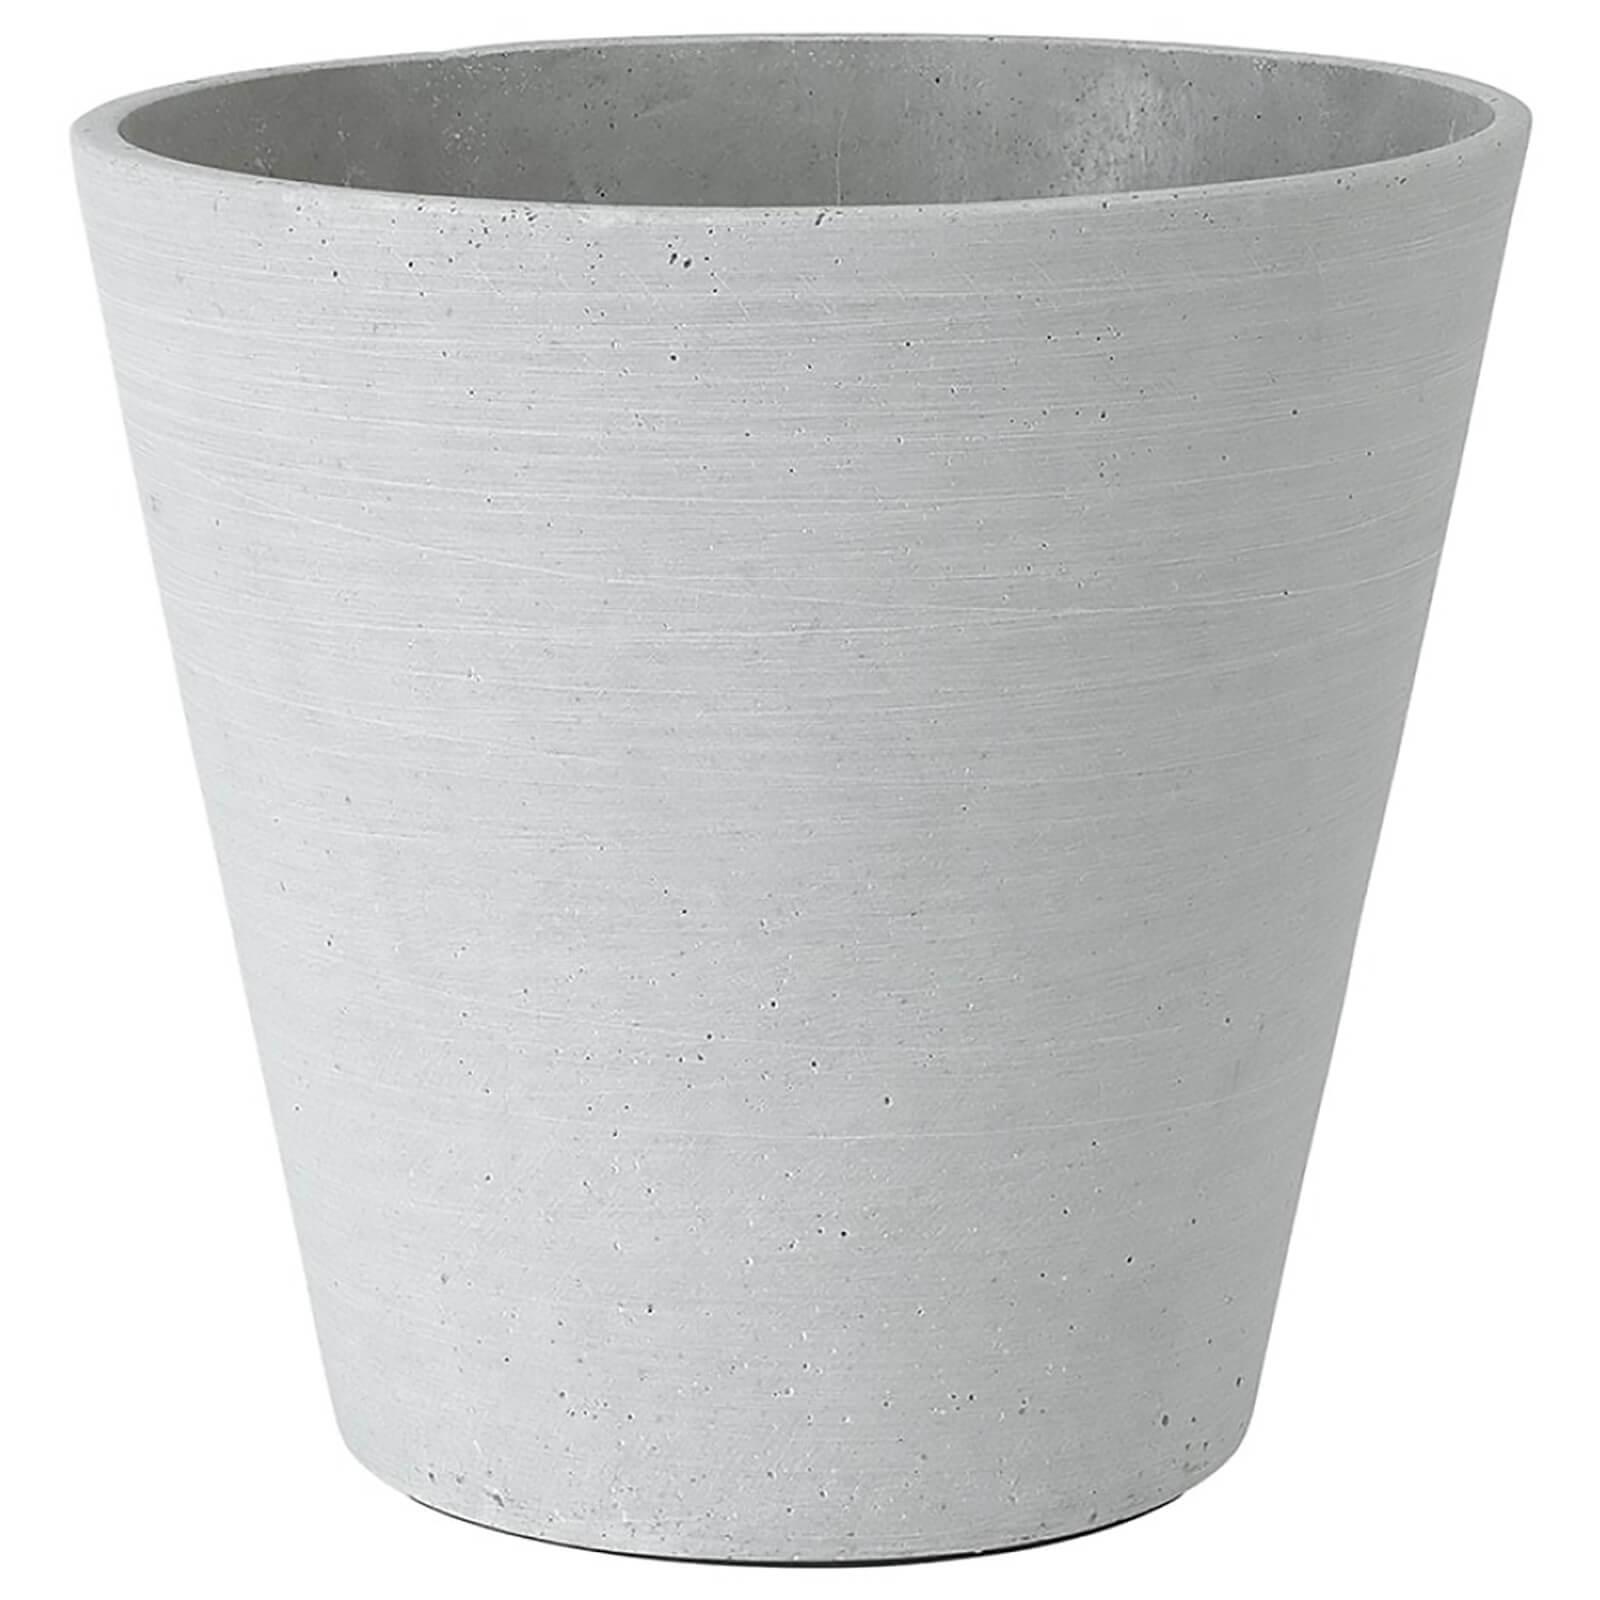 Blomus Coluna Flower Pot - Grey 24cm x 26cm